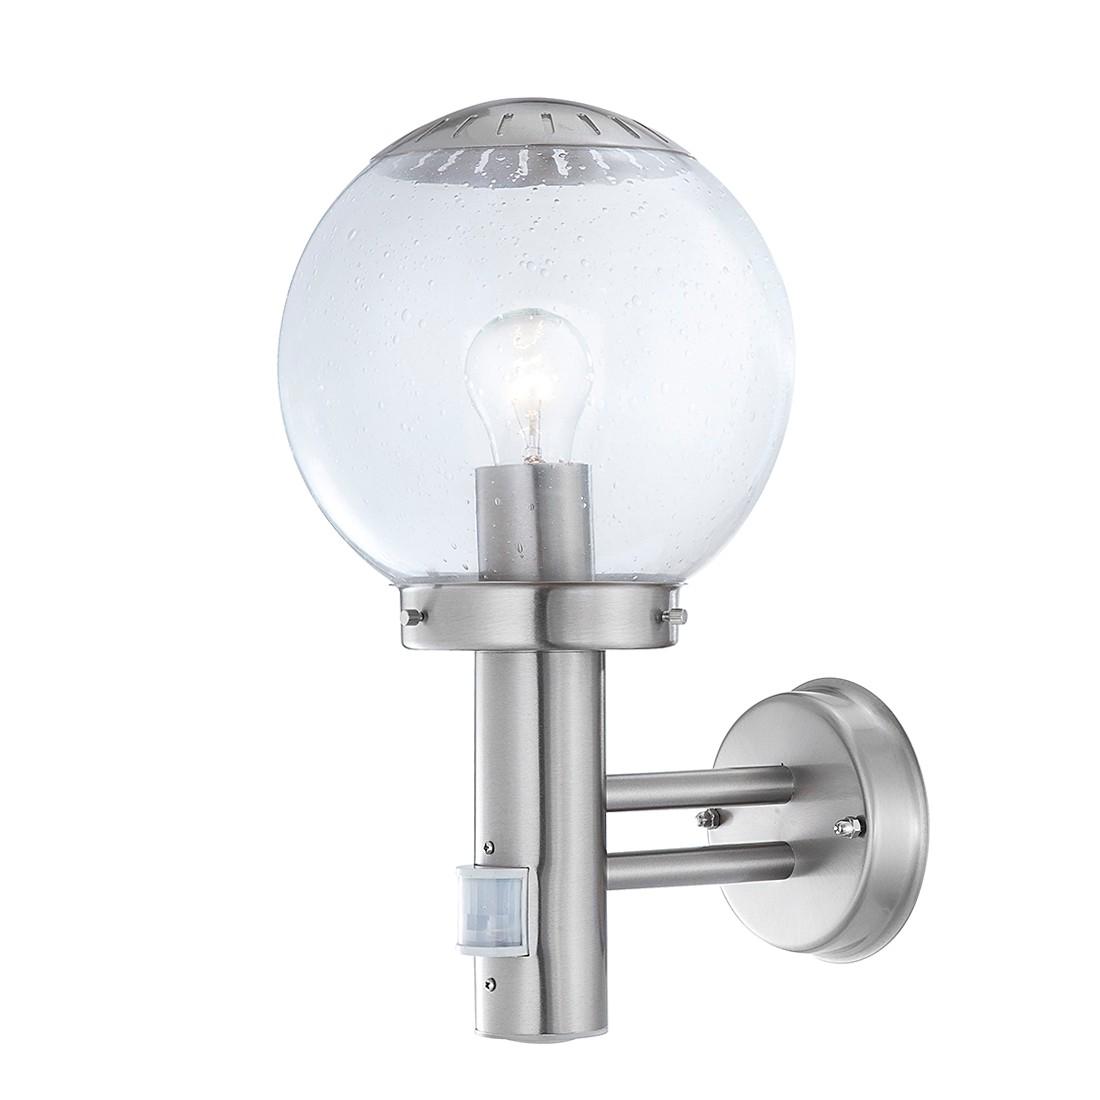 home24 Aussenlampe Bowle II